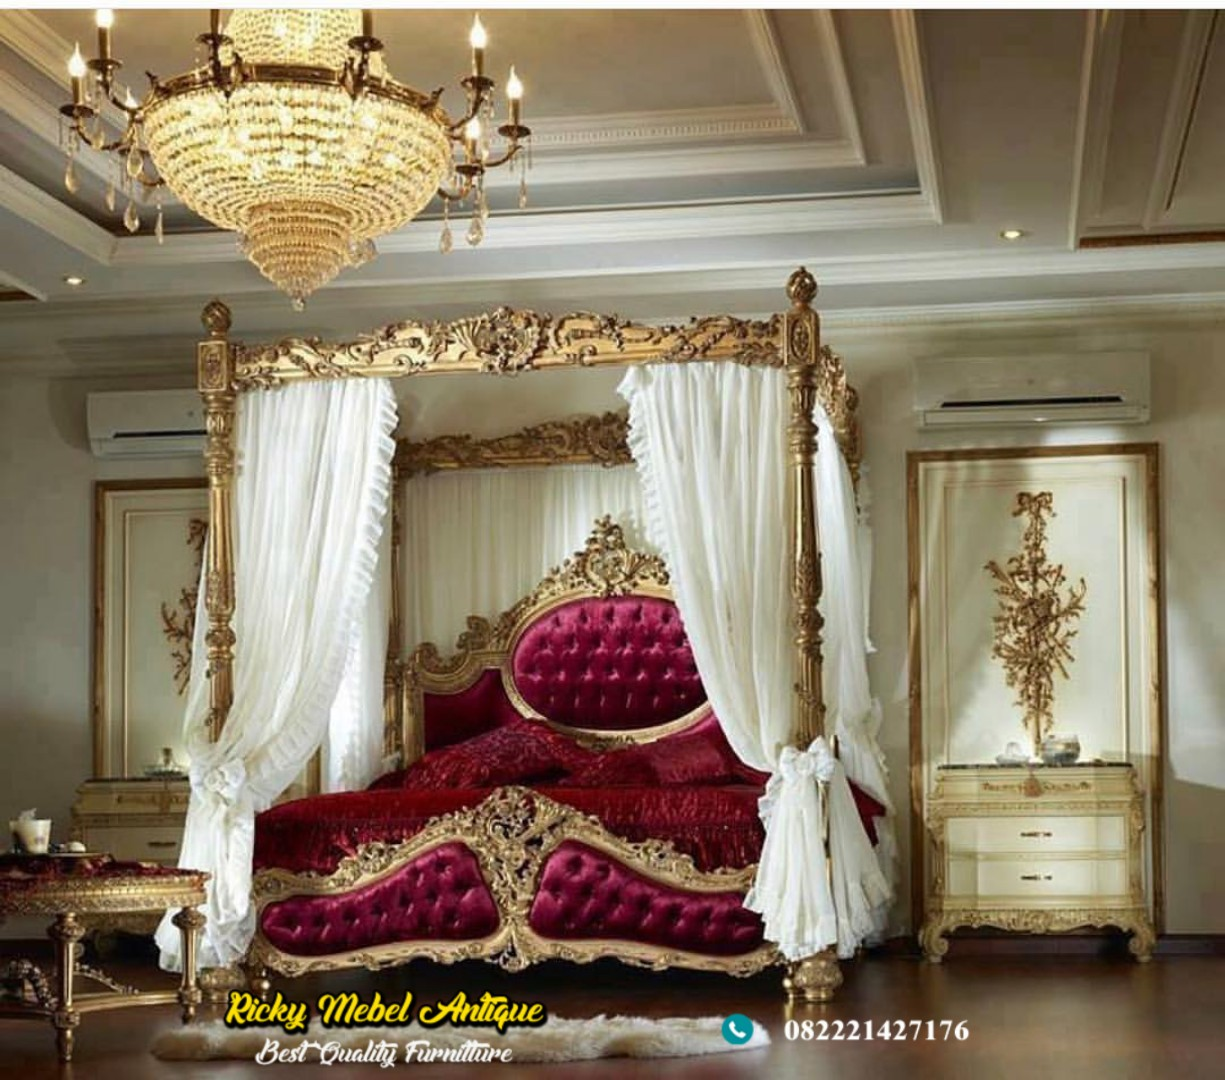 jual tempat tidur ukir mewah kanopi